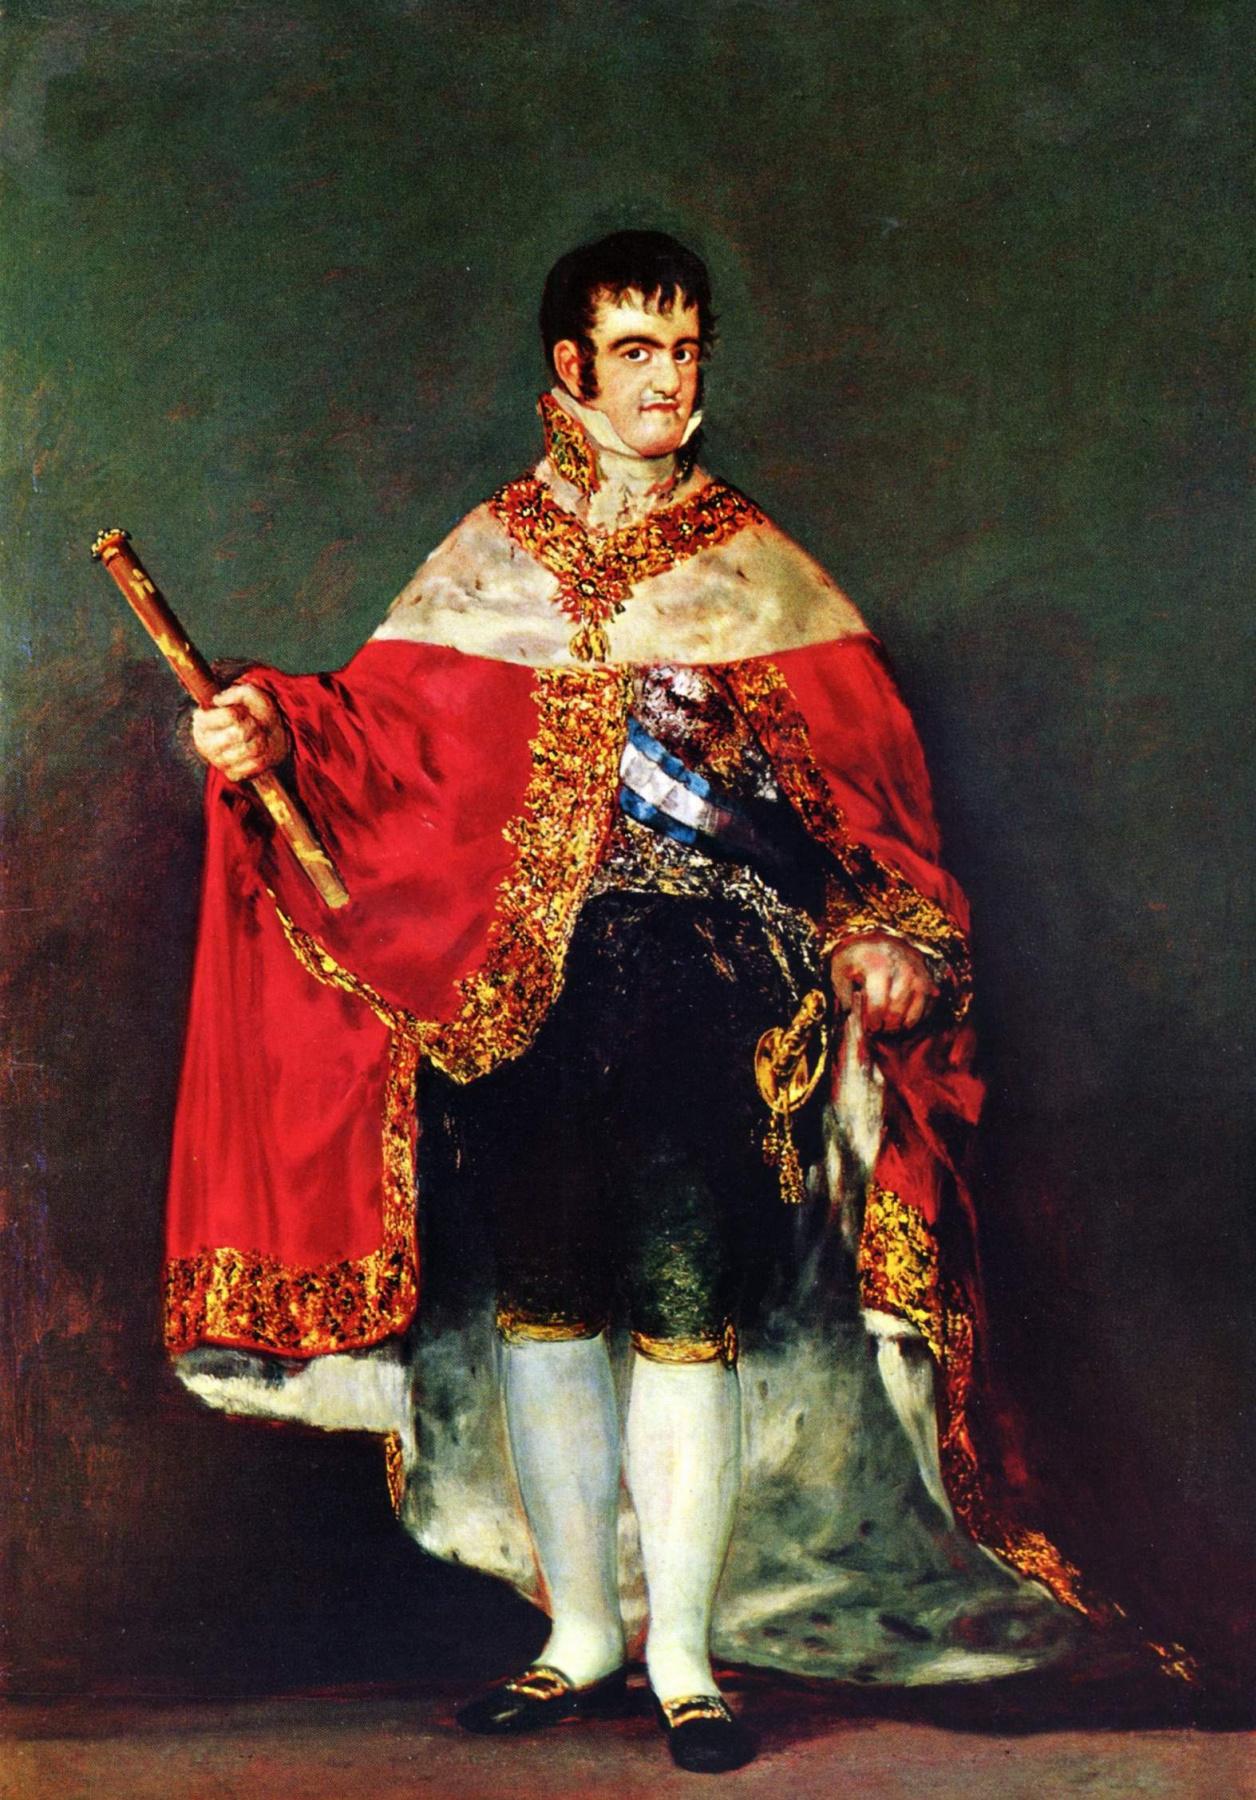 Francisco Goya. Portrait of king Ferdinand VII with Royal regalia